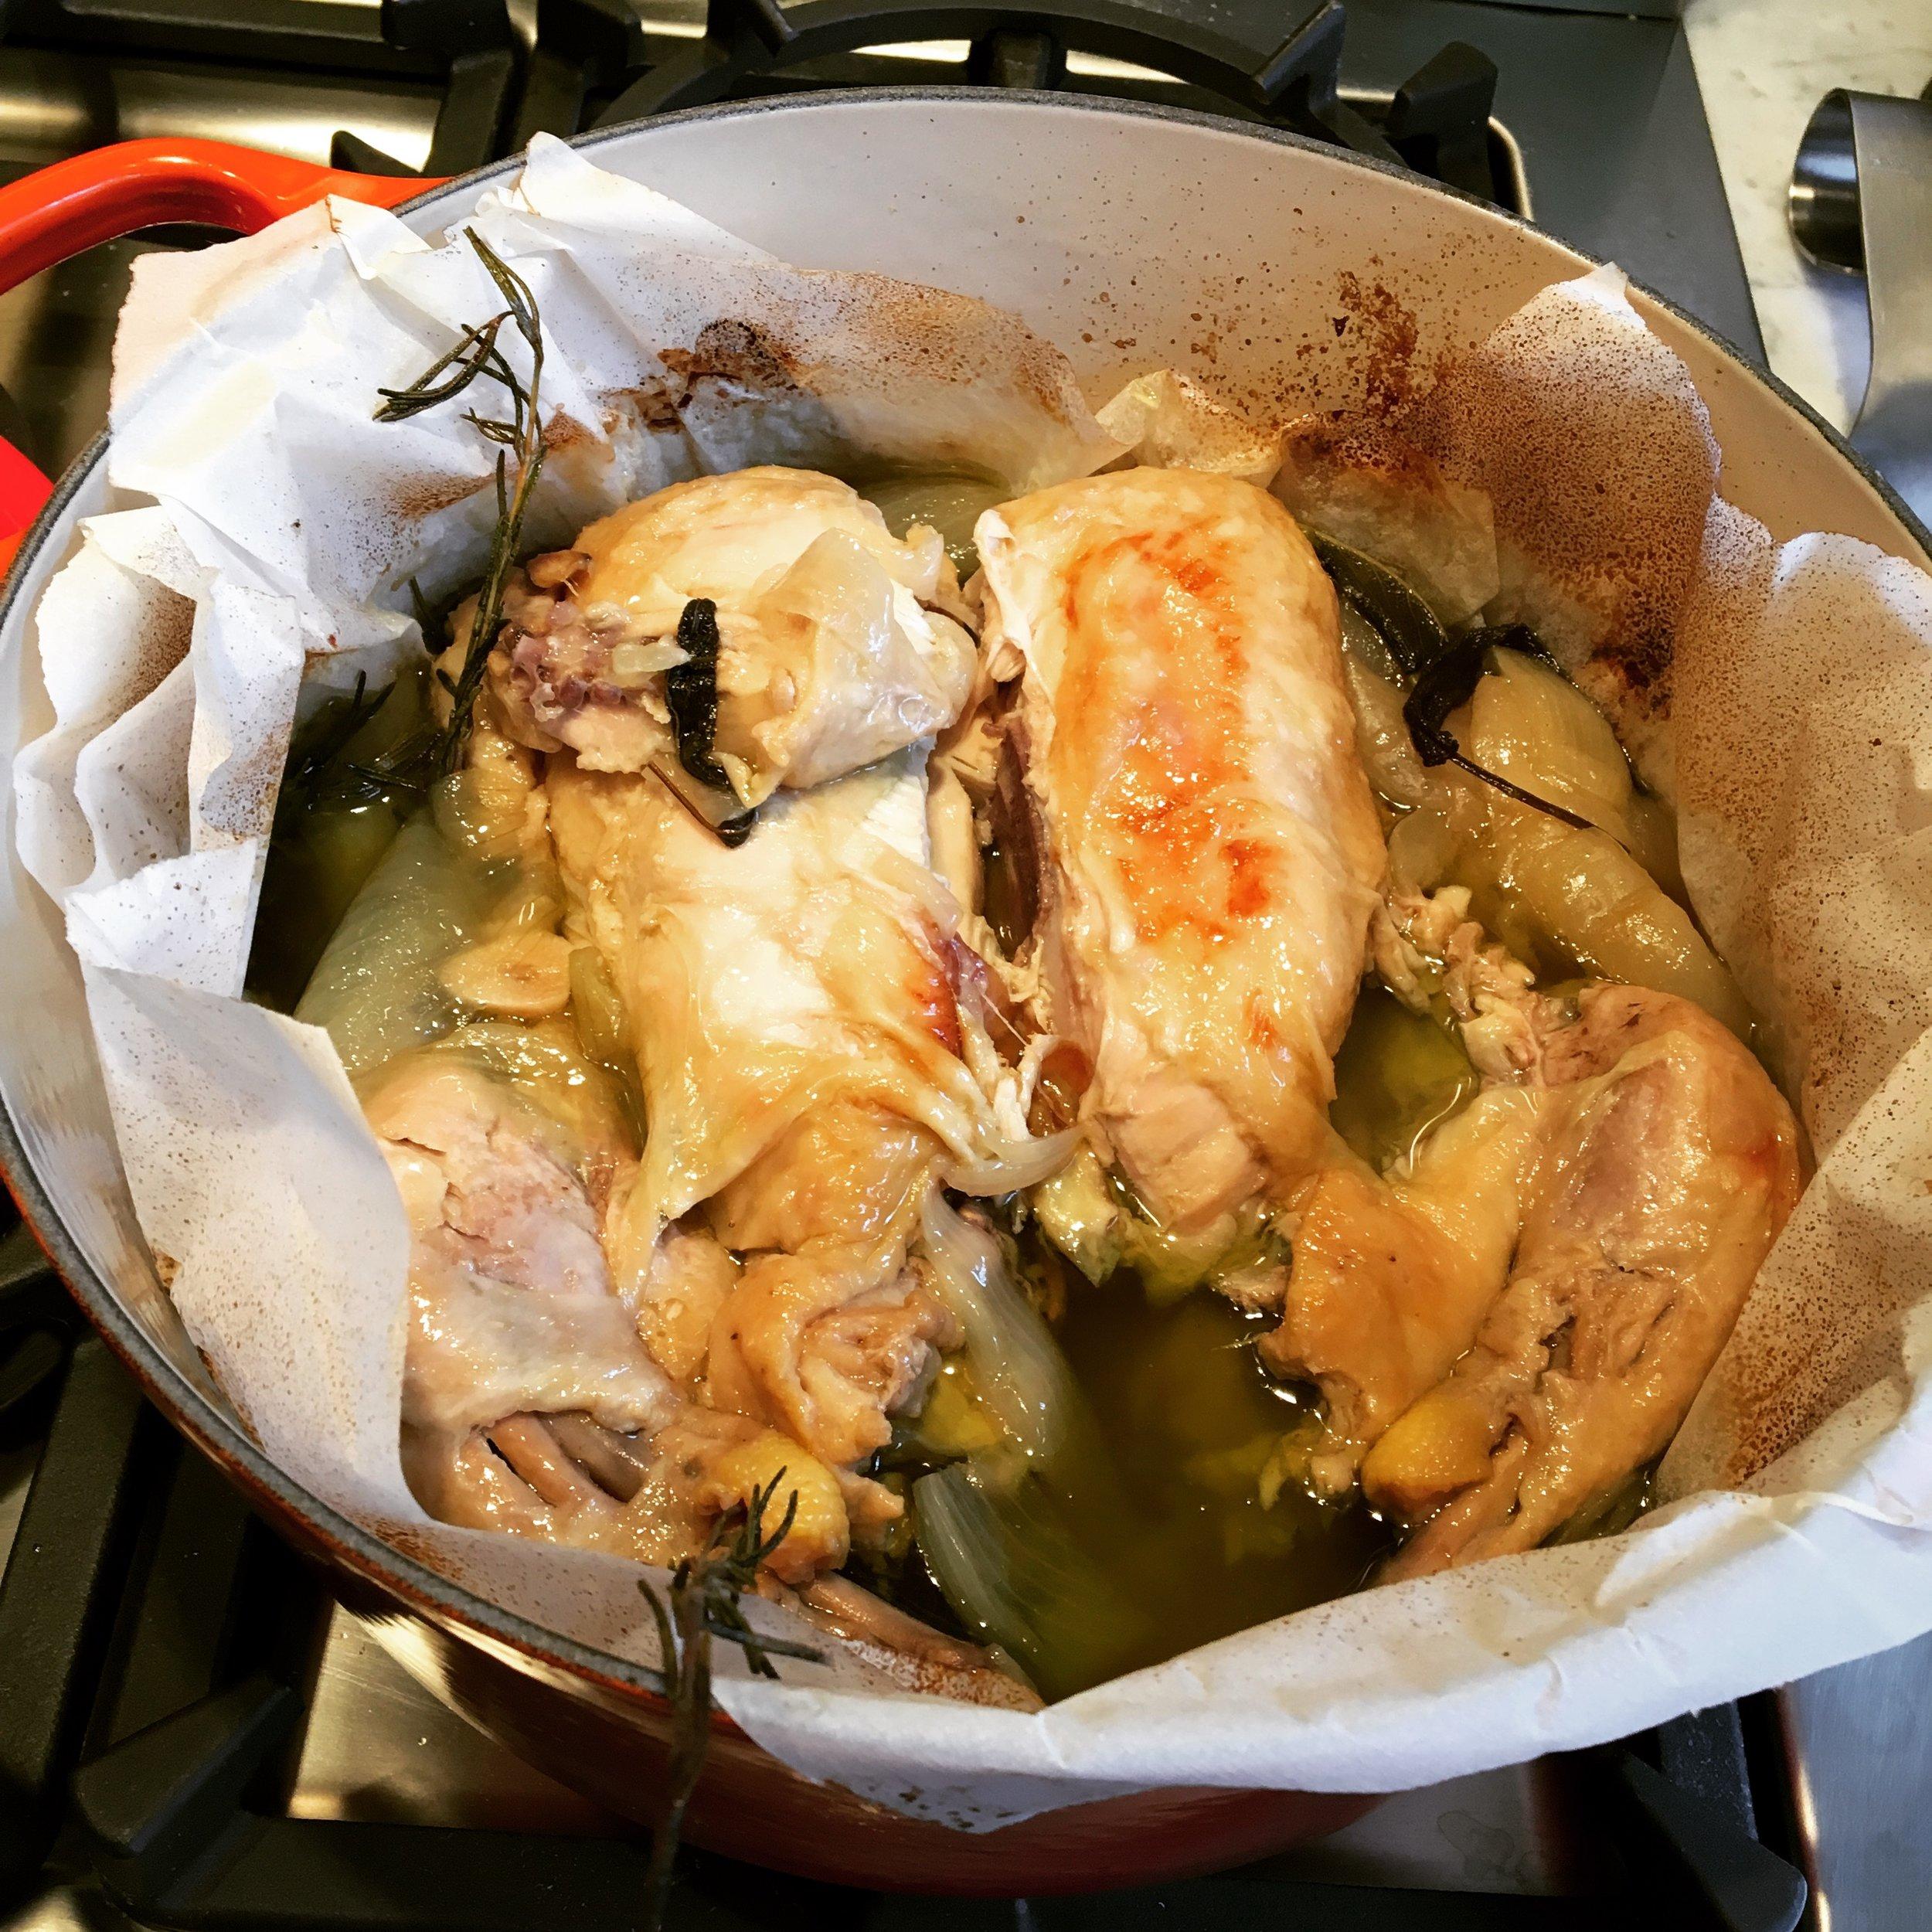 slow roast chicken2.jpg